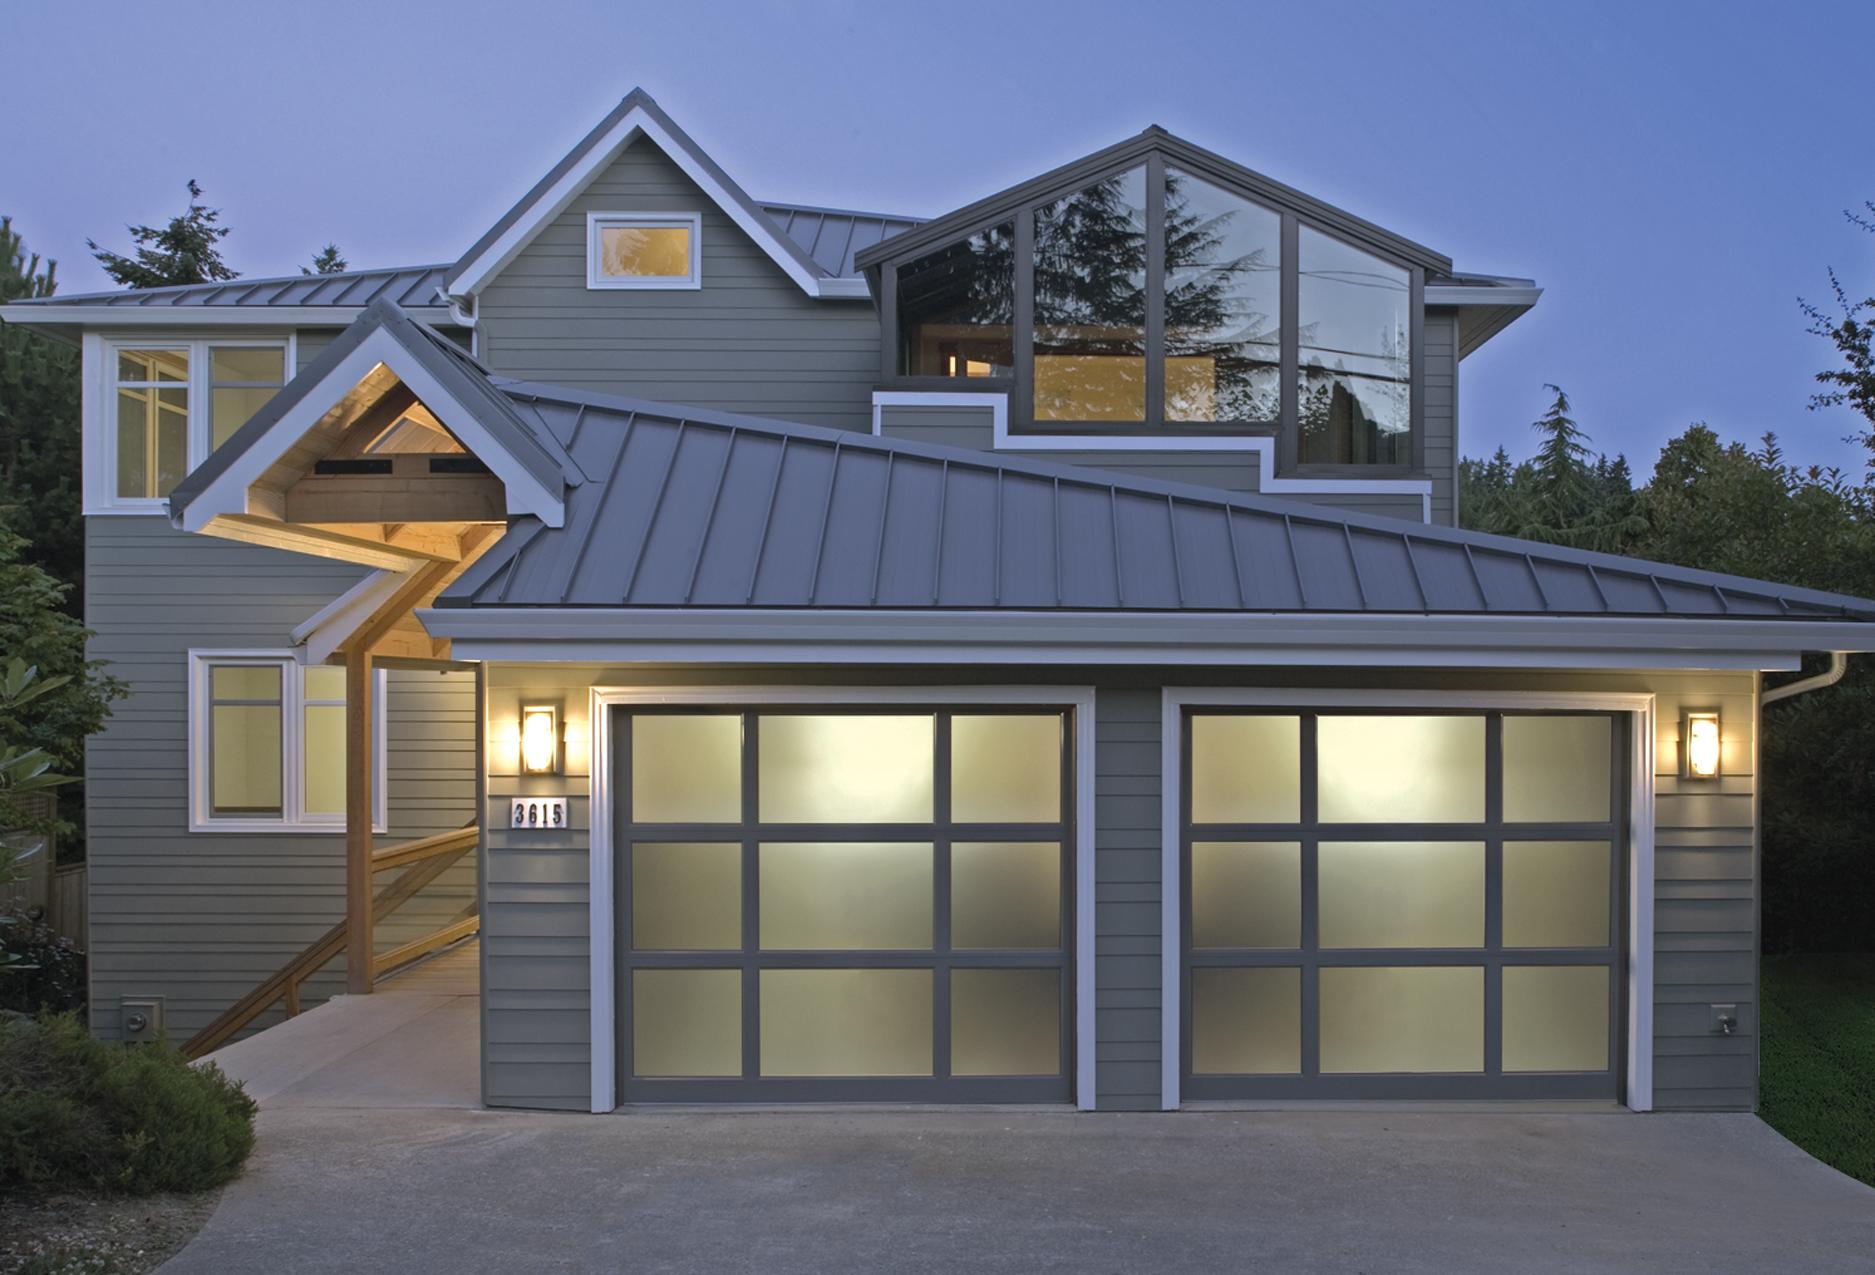 1275 #988E33 Garage Door Installation Articles save image Garage Doors Systems 35871875